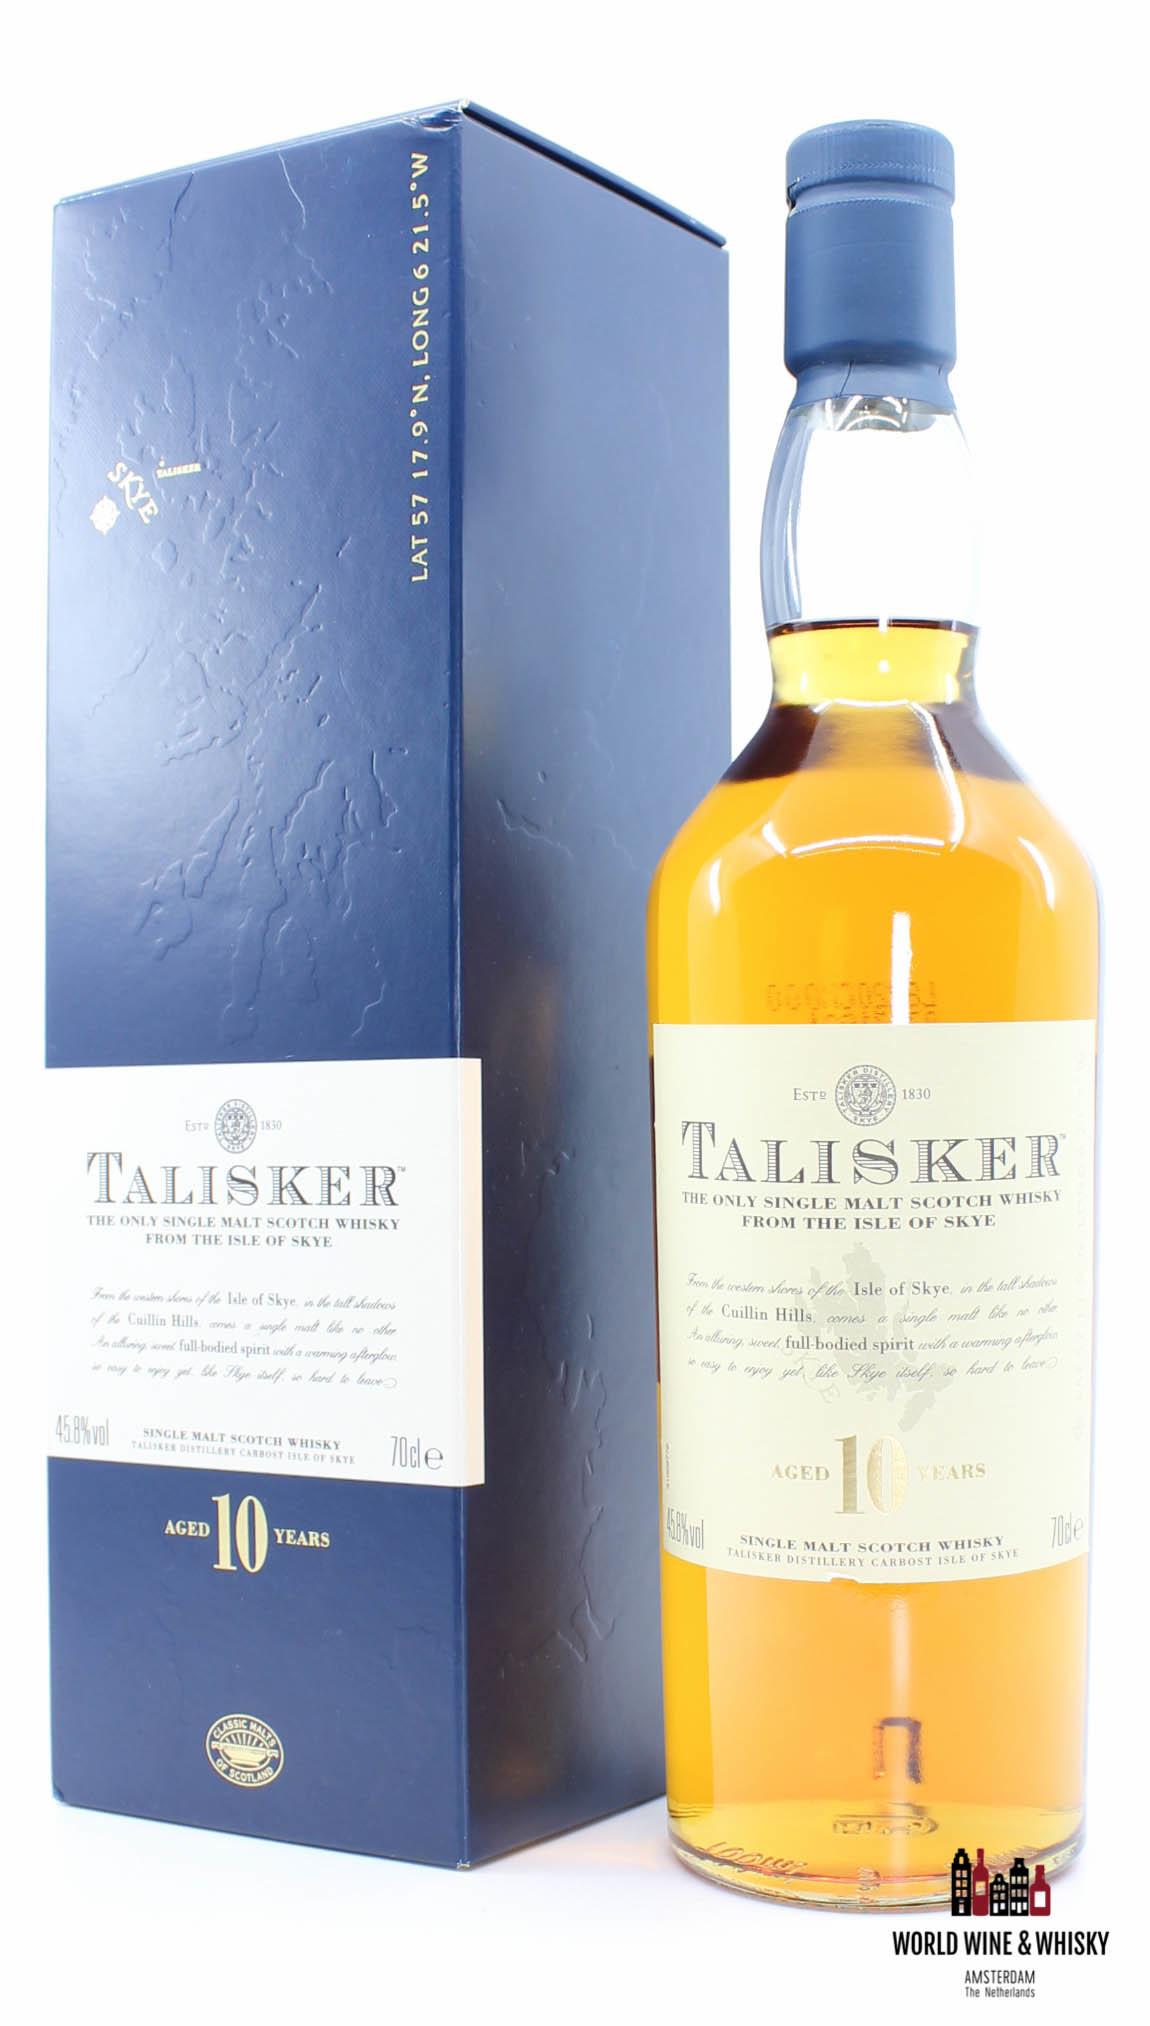 Talisker Talisker 10 Years Old 2008 - Isle of Skye 45.8% 700ml